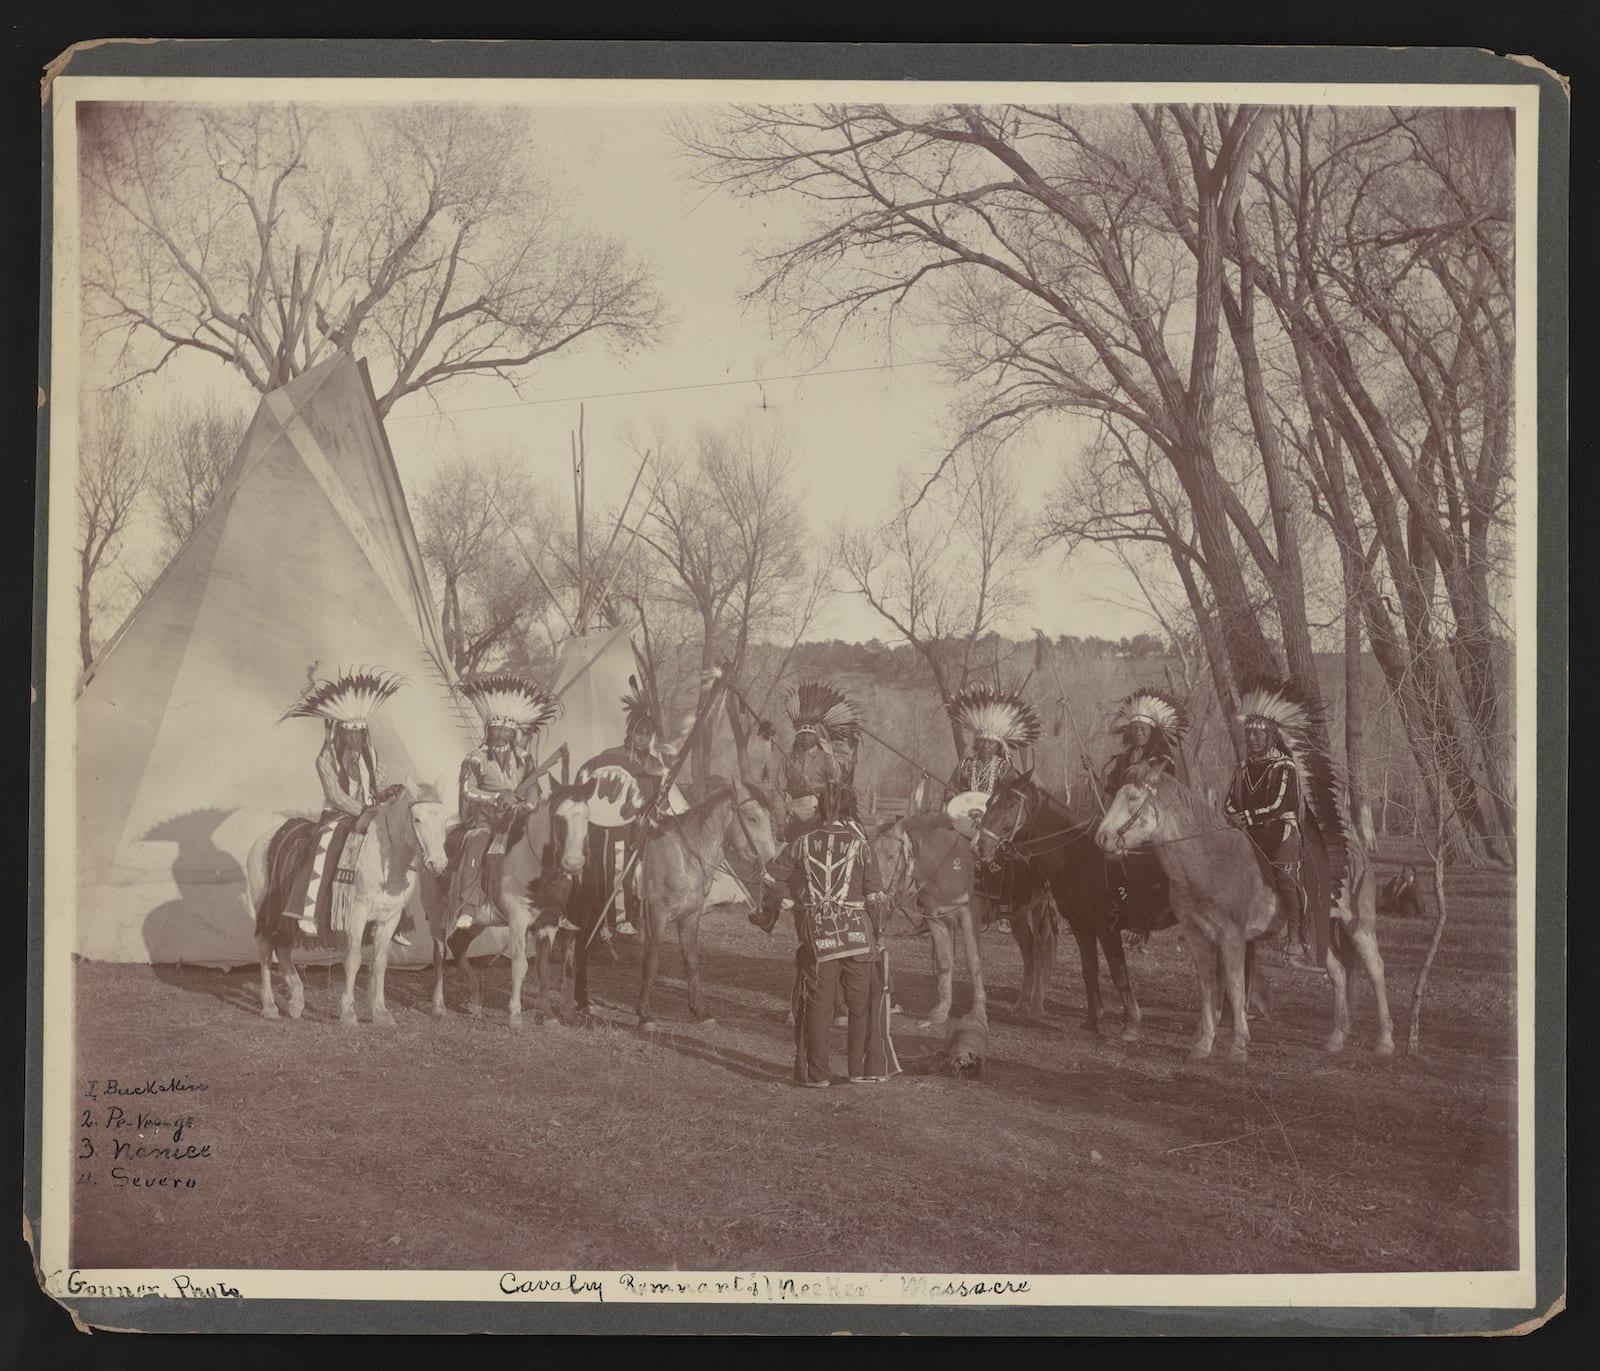 Cavalry Remnant of Meeker Massacre